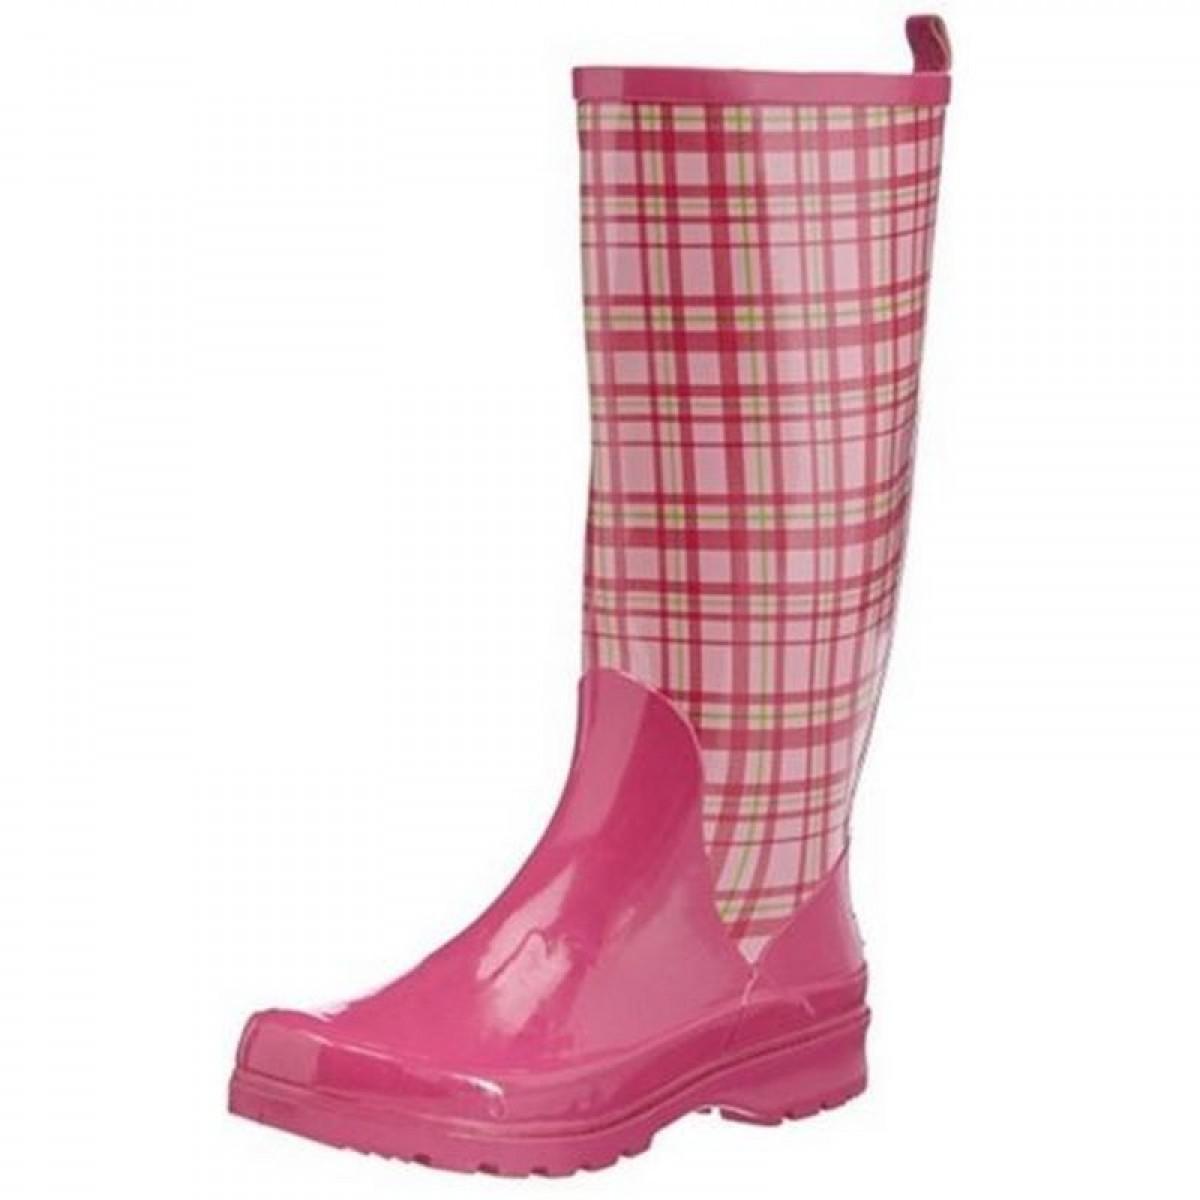 new concept 7c4d1 1b548 Playshoes Damen Gummistiefel Karo Pink